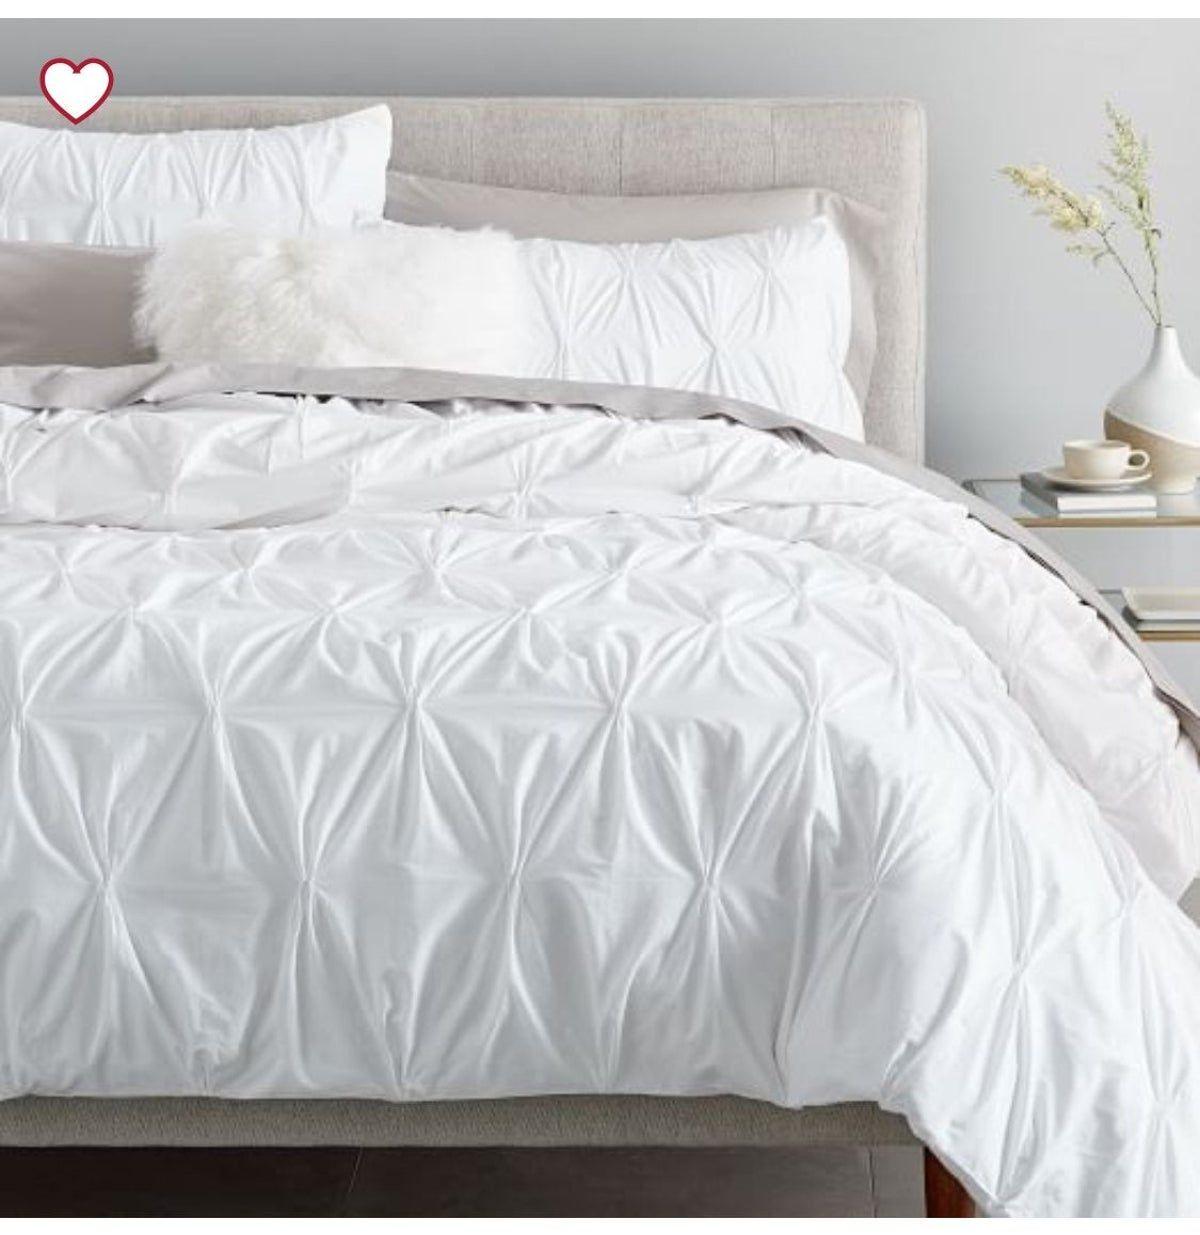 Pin By Tara Gray On Decor Pintuck Duvet Cover Modern Bed Duvet